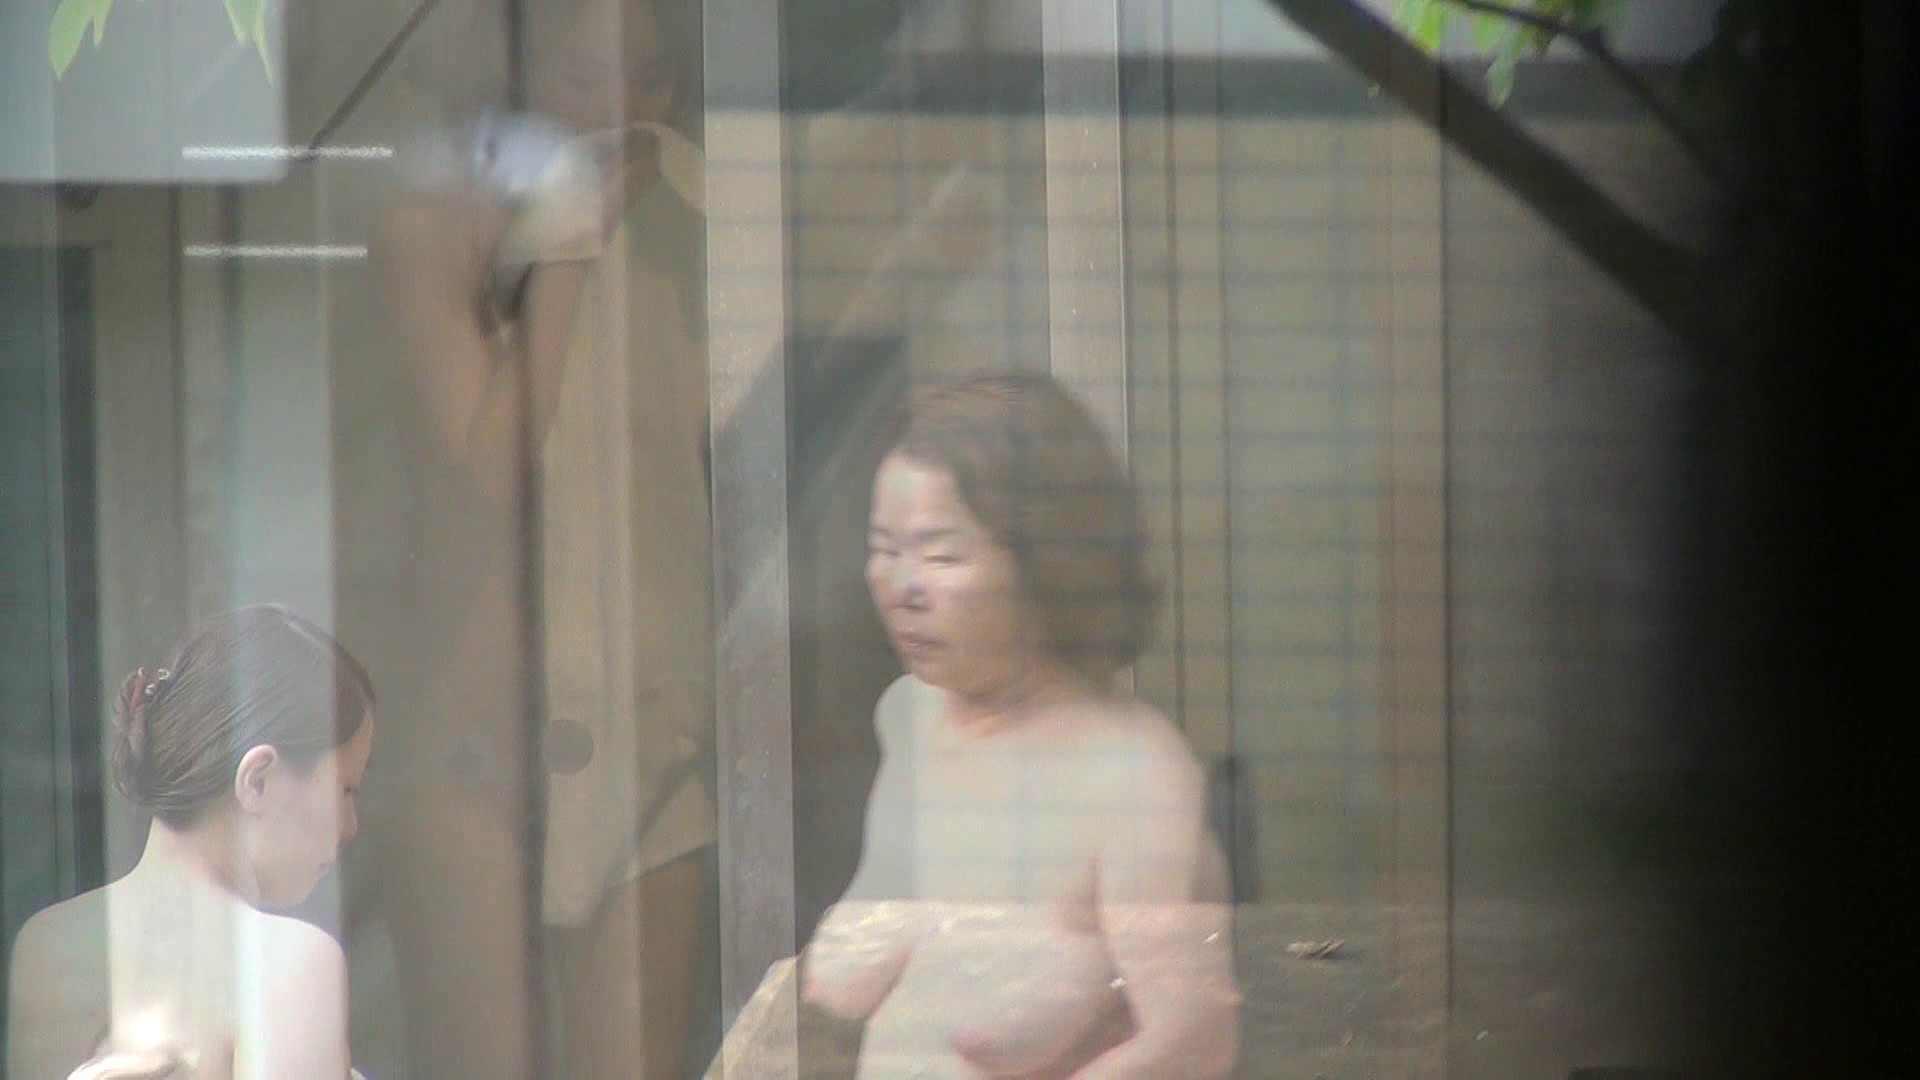 Aquaな露天風呂Vol.297 OLセックス 隠し撮りオマンコ動画紹介 103画像 11